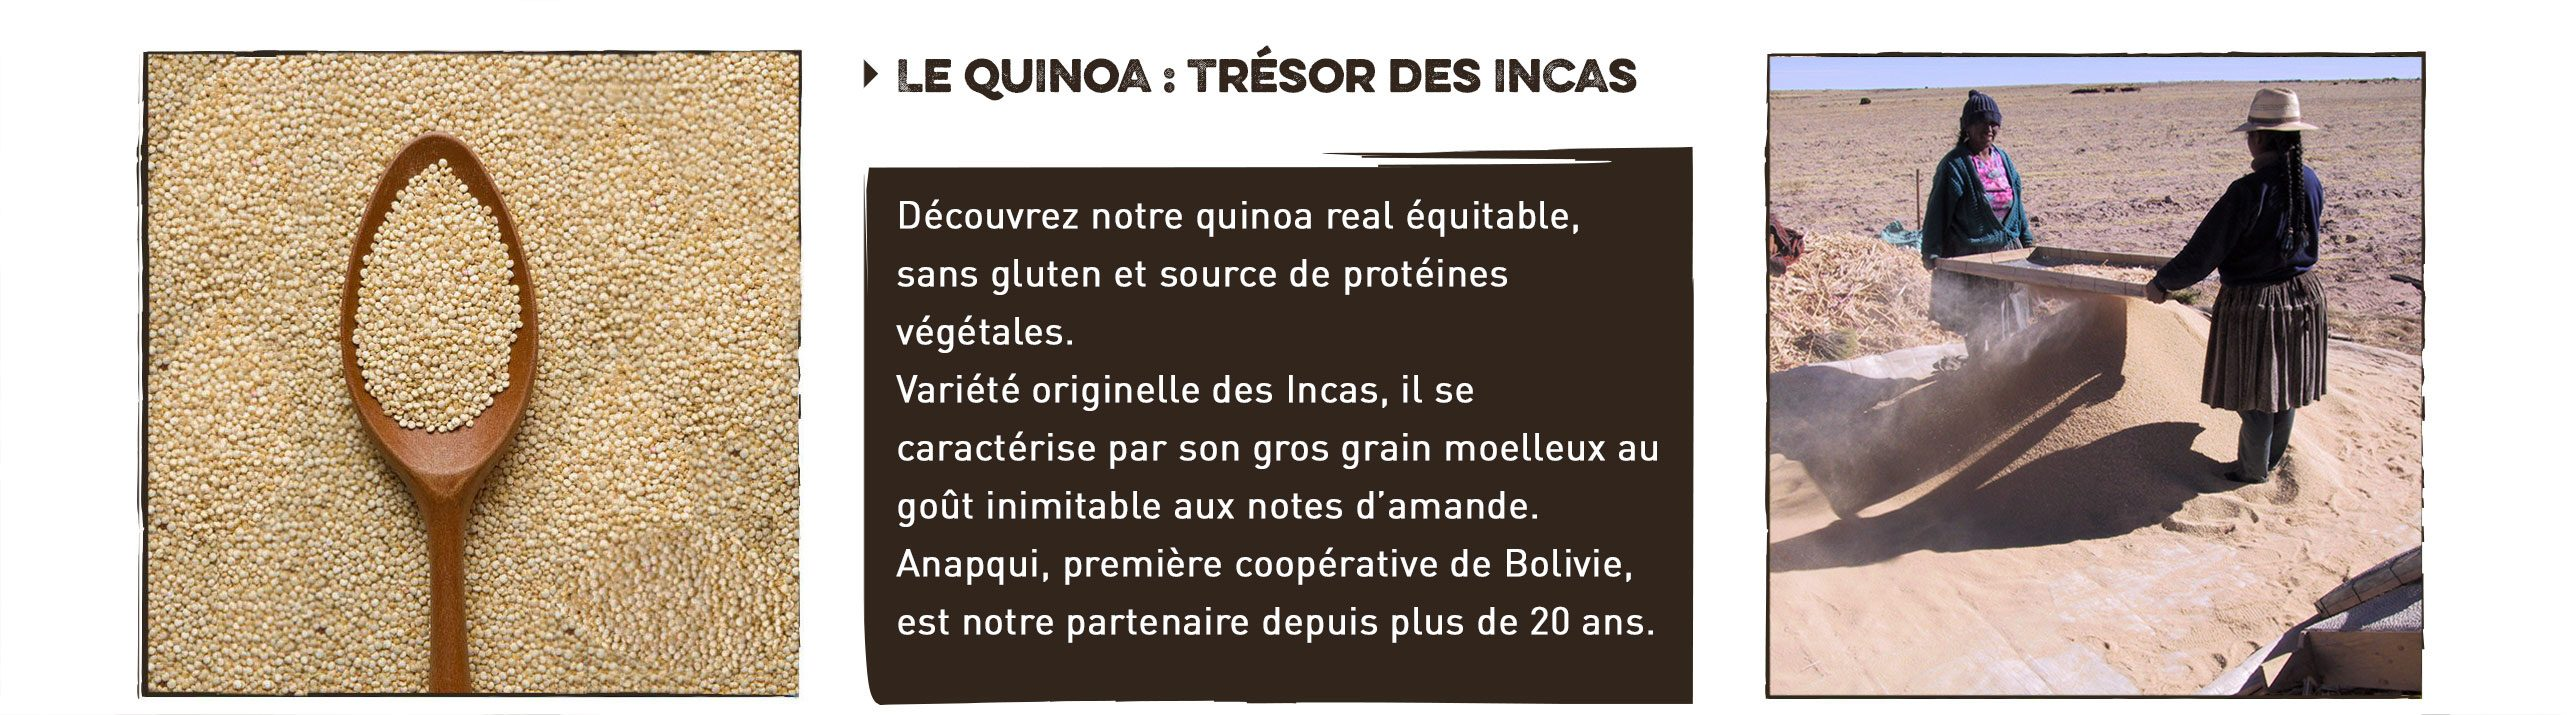 quinoa : trésor des incas